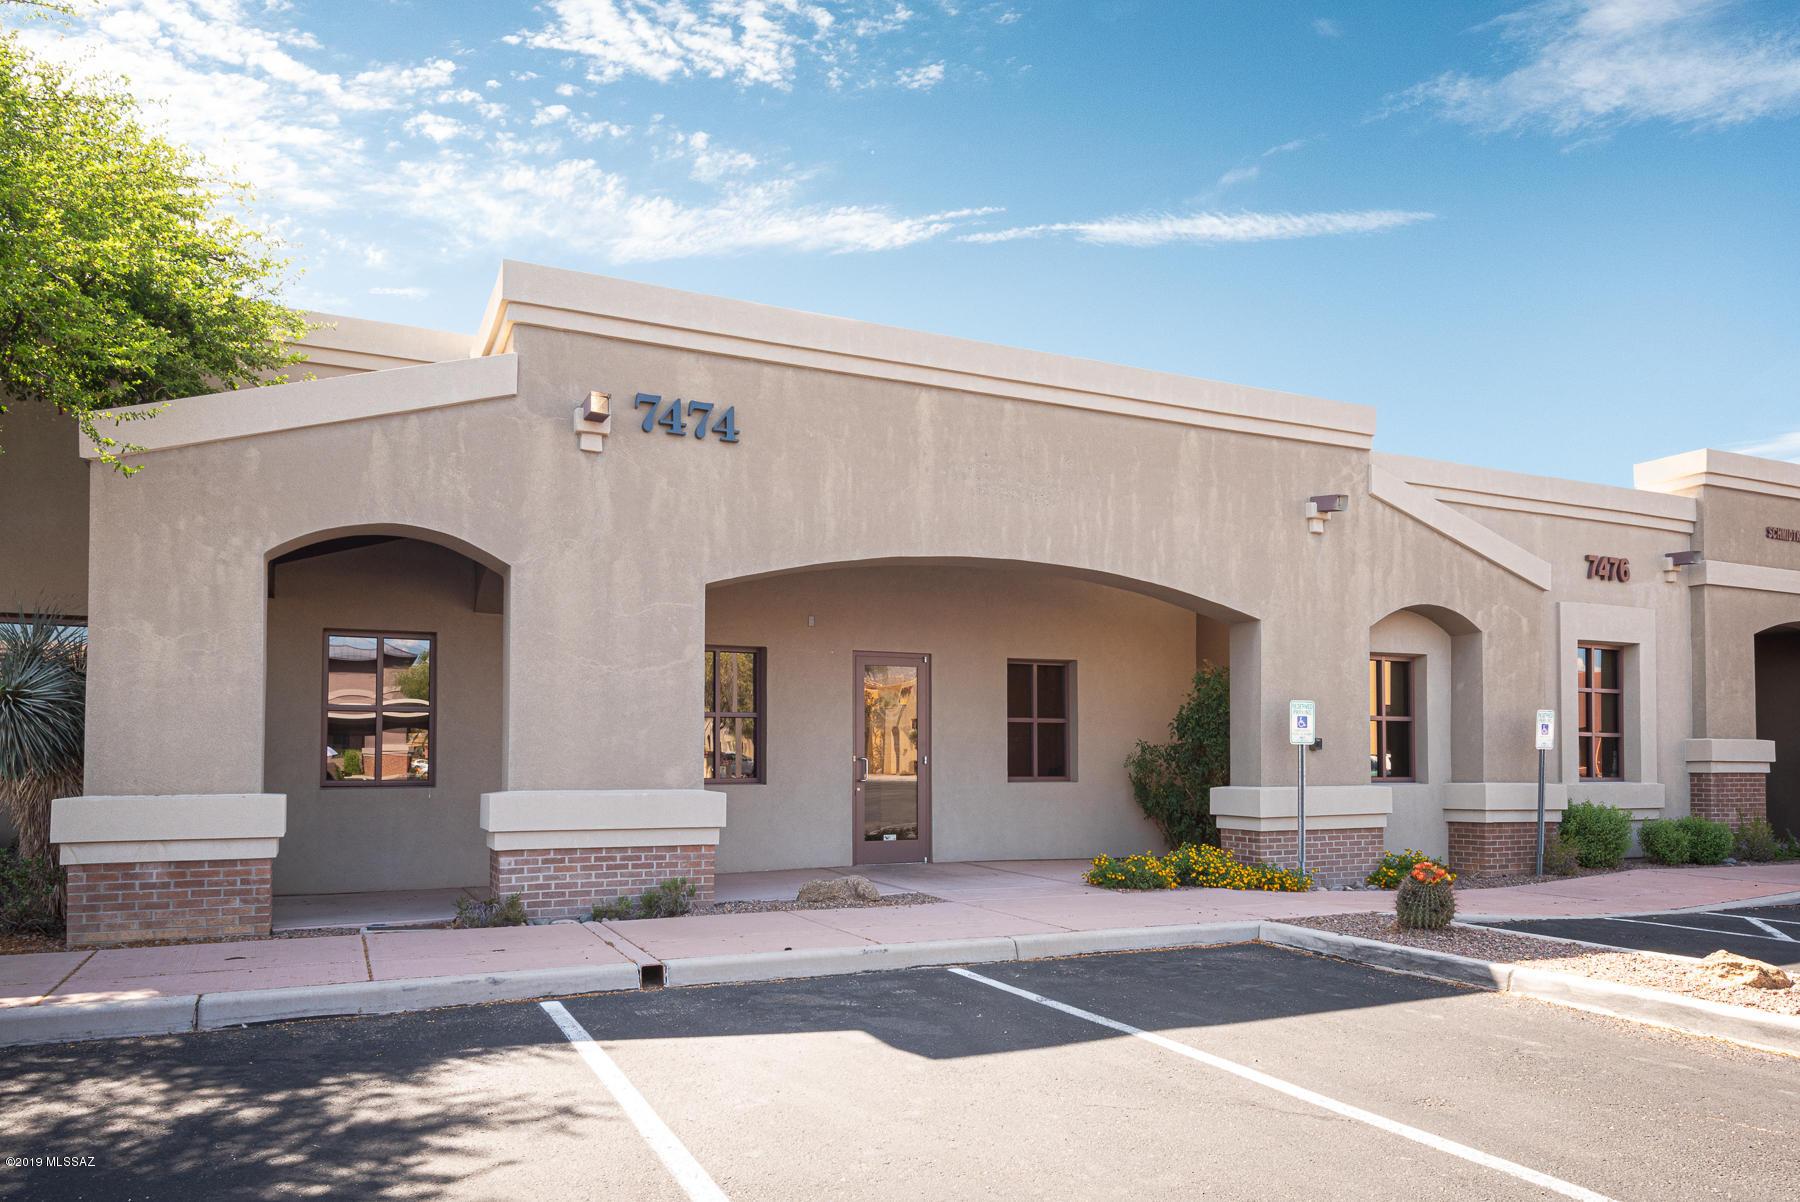 Photo of 7474 N La Cholla Boulevard, Tucson, AZ 85741